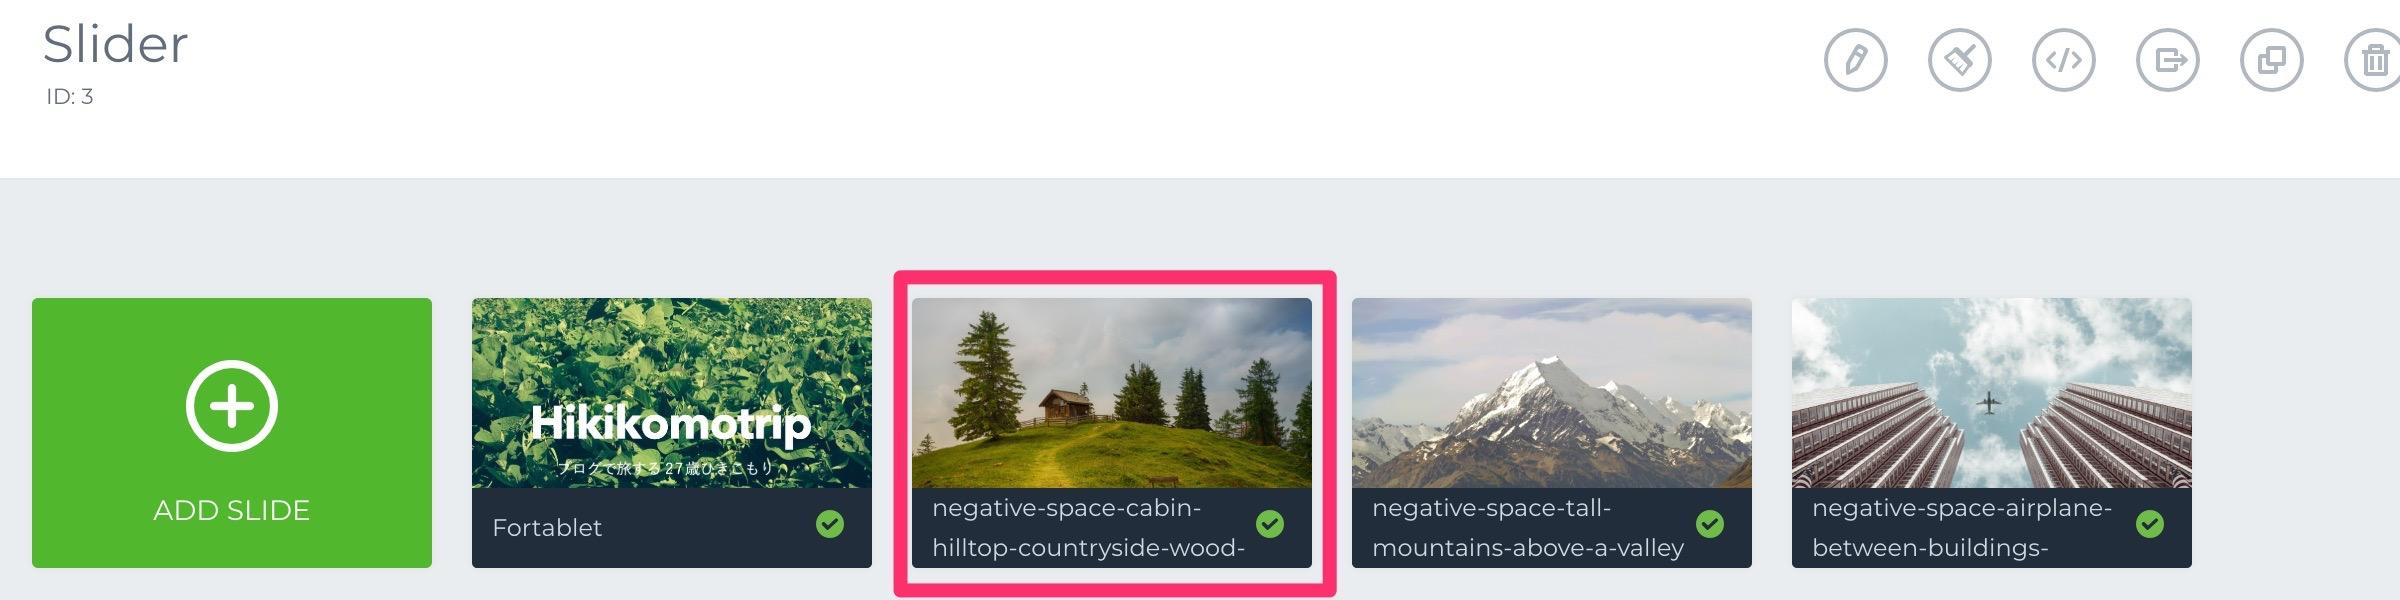 Smart Slider Hikikomotrip WordPress